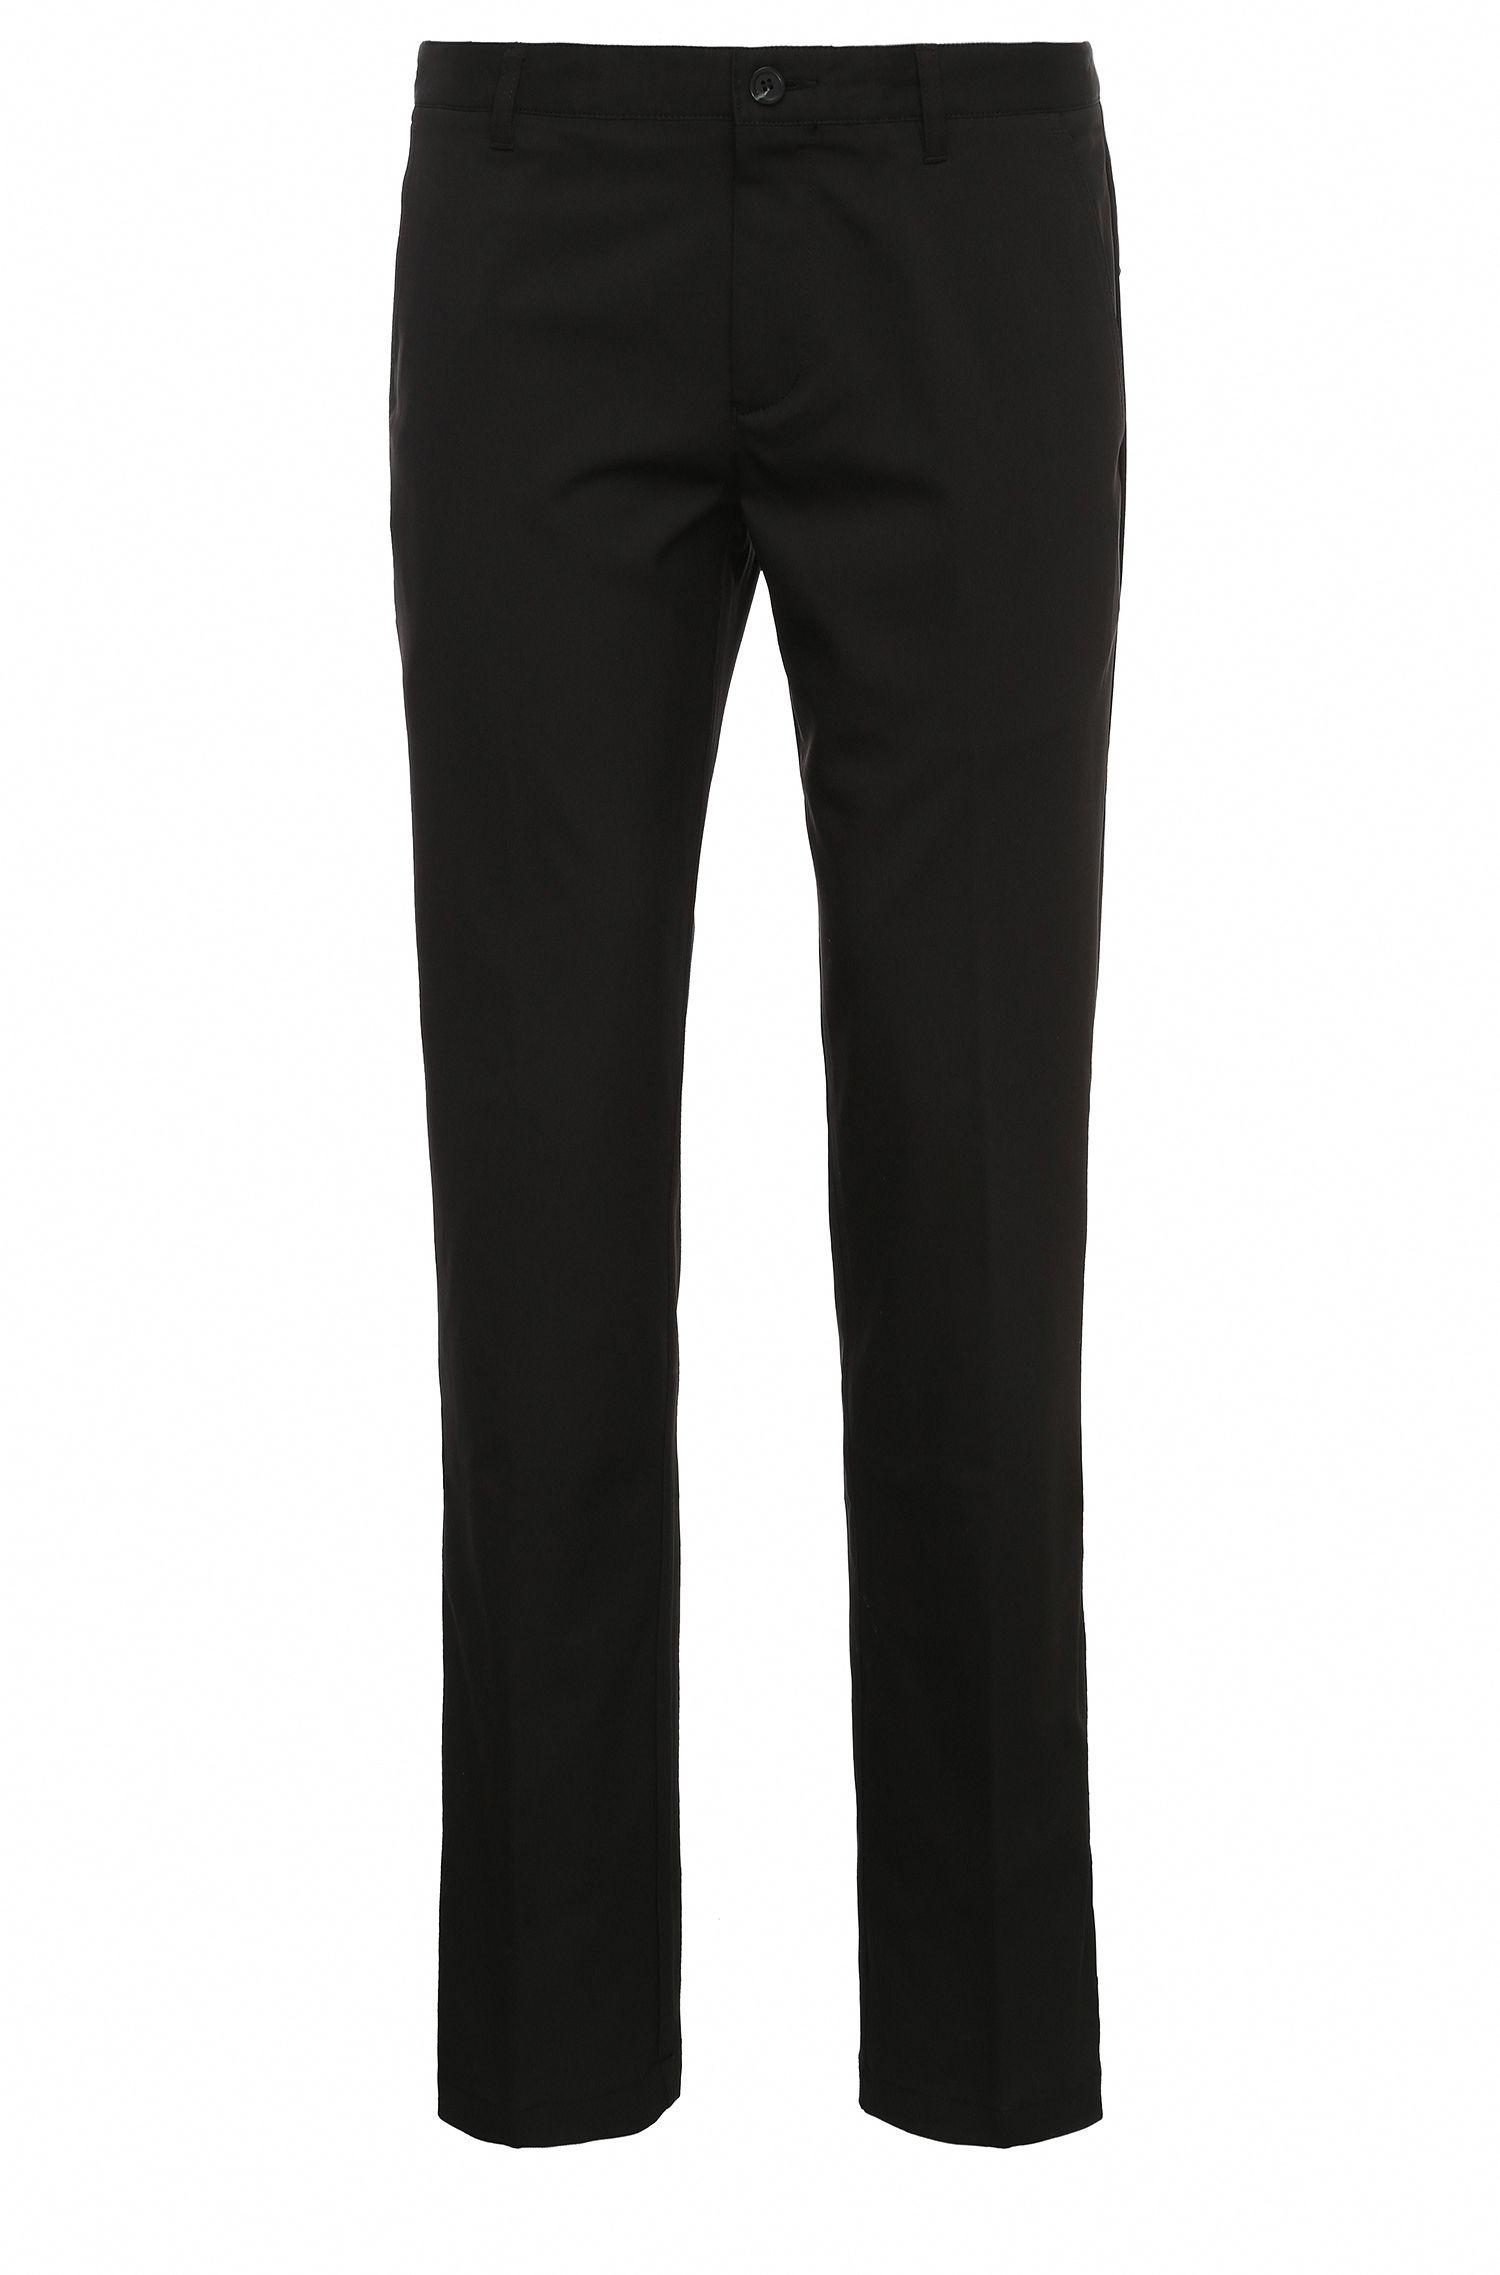 CoolMax Performance Golf Pants, Slim Fit   Hakan